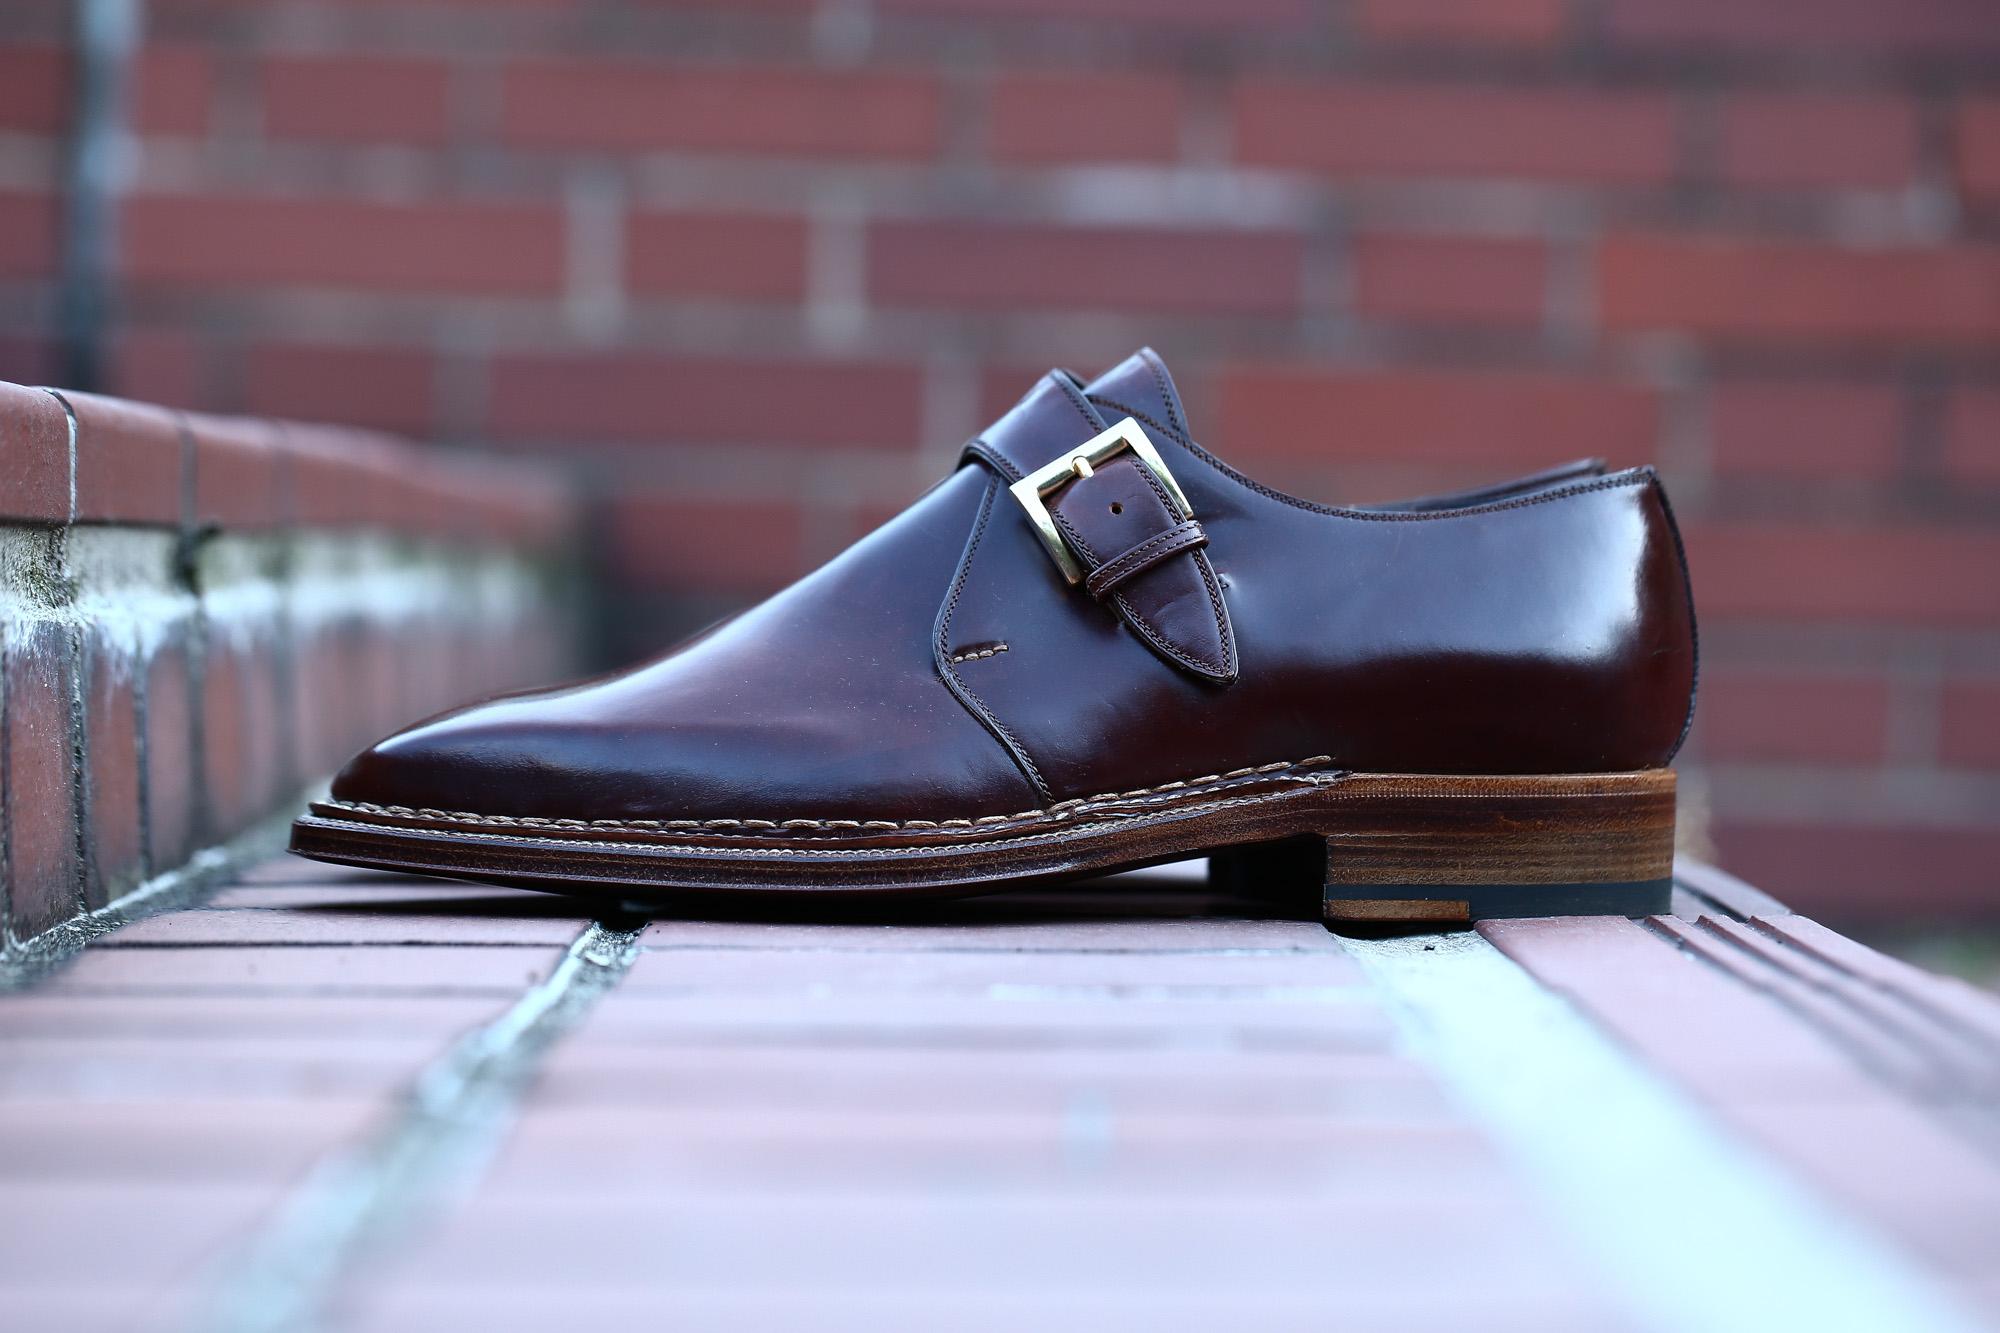 ENZO BONAFE (エンツォボナフェ) 【ART.3721】Single Monk Strap Shoes シングルモンクストラップシューズ CORDOVAN コードバン ノルベジェーゼ製法 ドレスシューズ No.4(#4) made in italy (イタリア製) 2018 春夏新作 愛知 名古屋 ZODIAC ゾディアック enzobonafe コードバン no4 ナンバーフォー